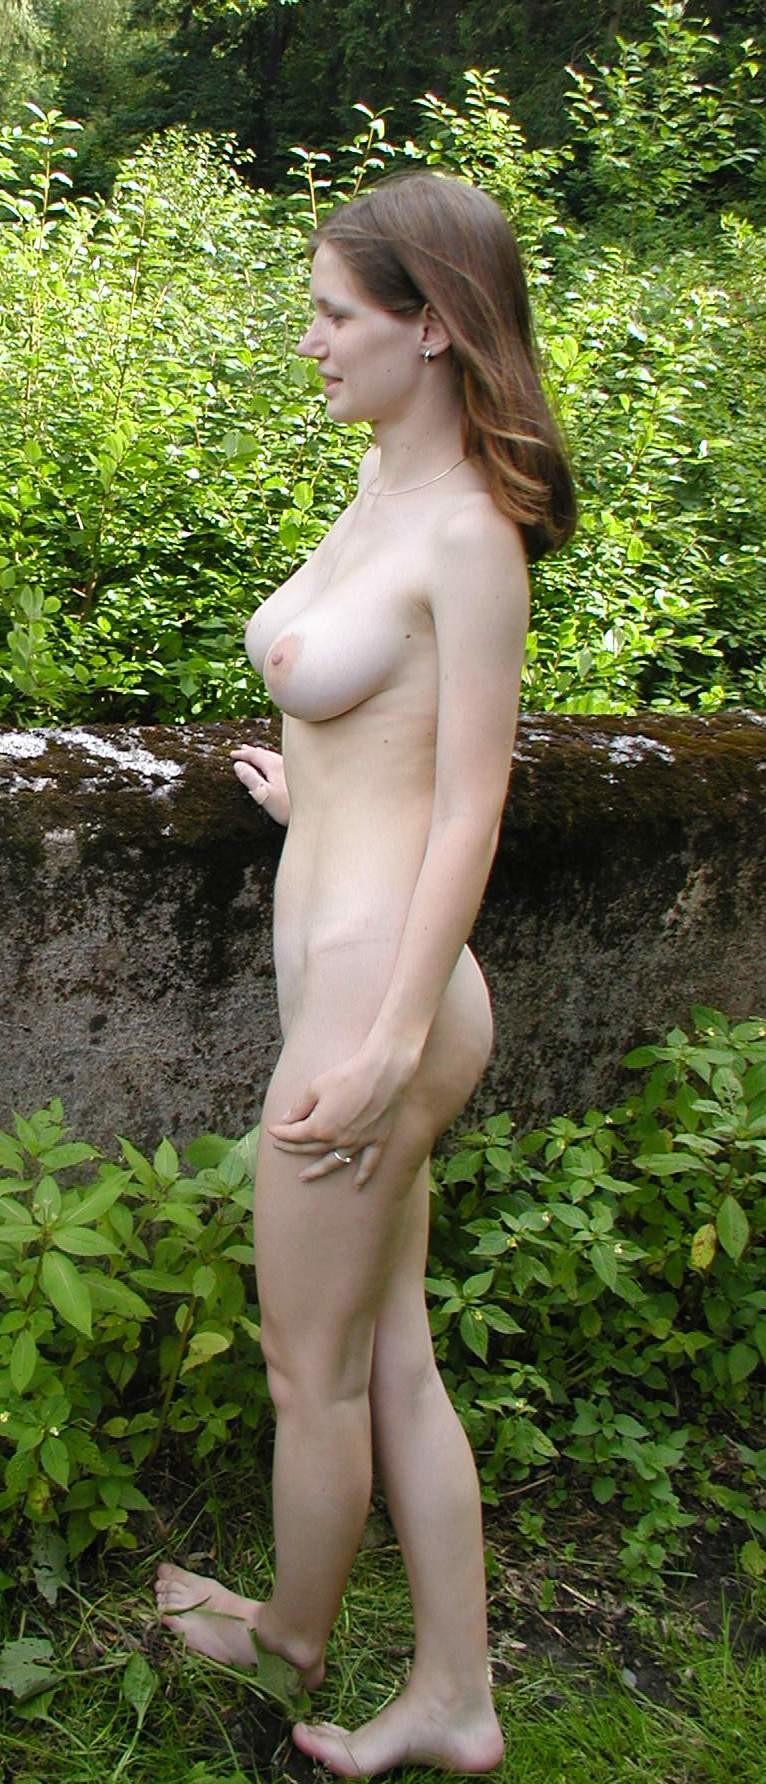 Провинциалки голые фото 19 фотография